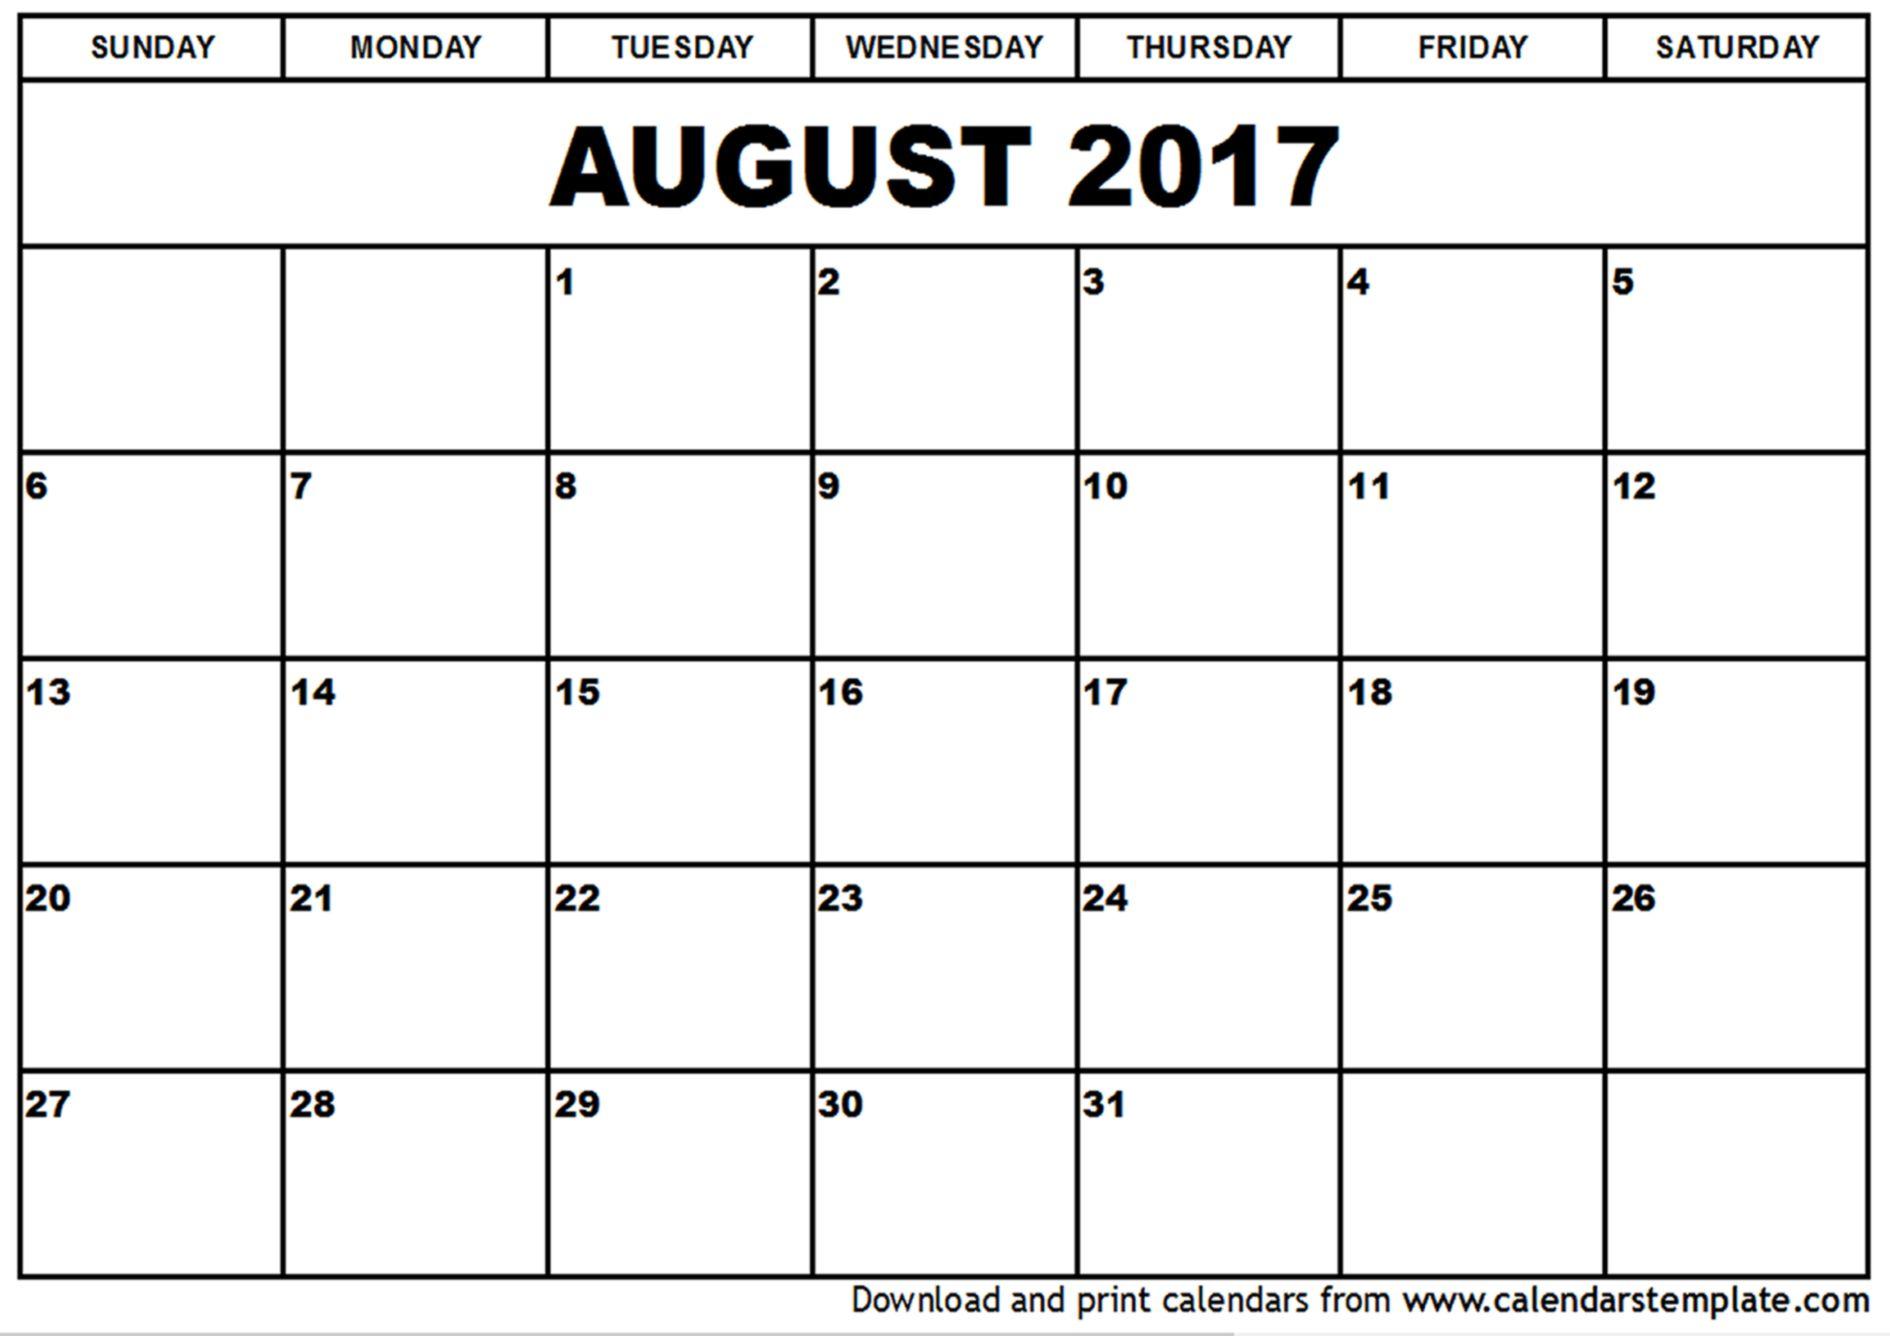 august 2017 calendar, calendar august 2017, 2017 august calendar ...